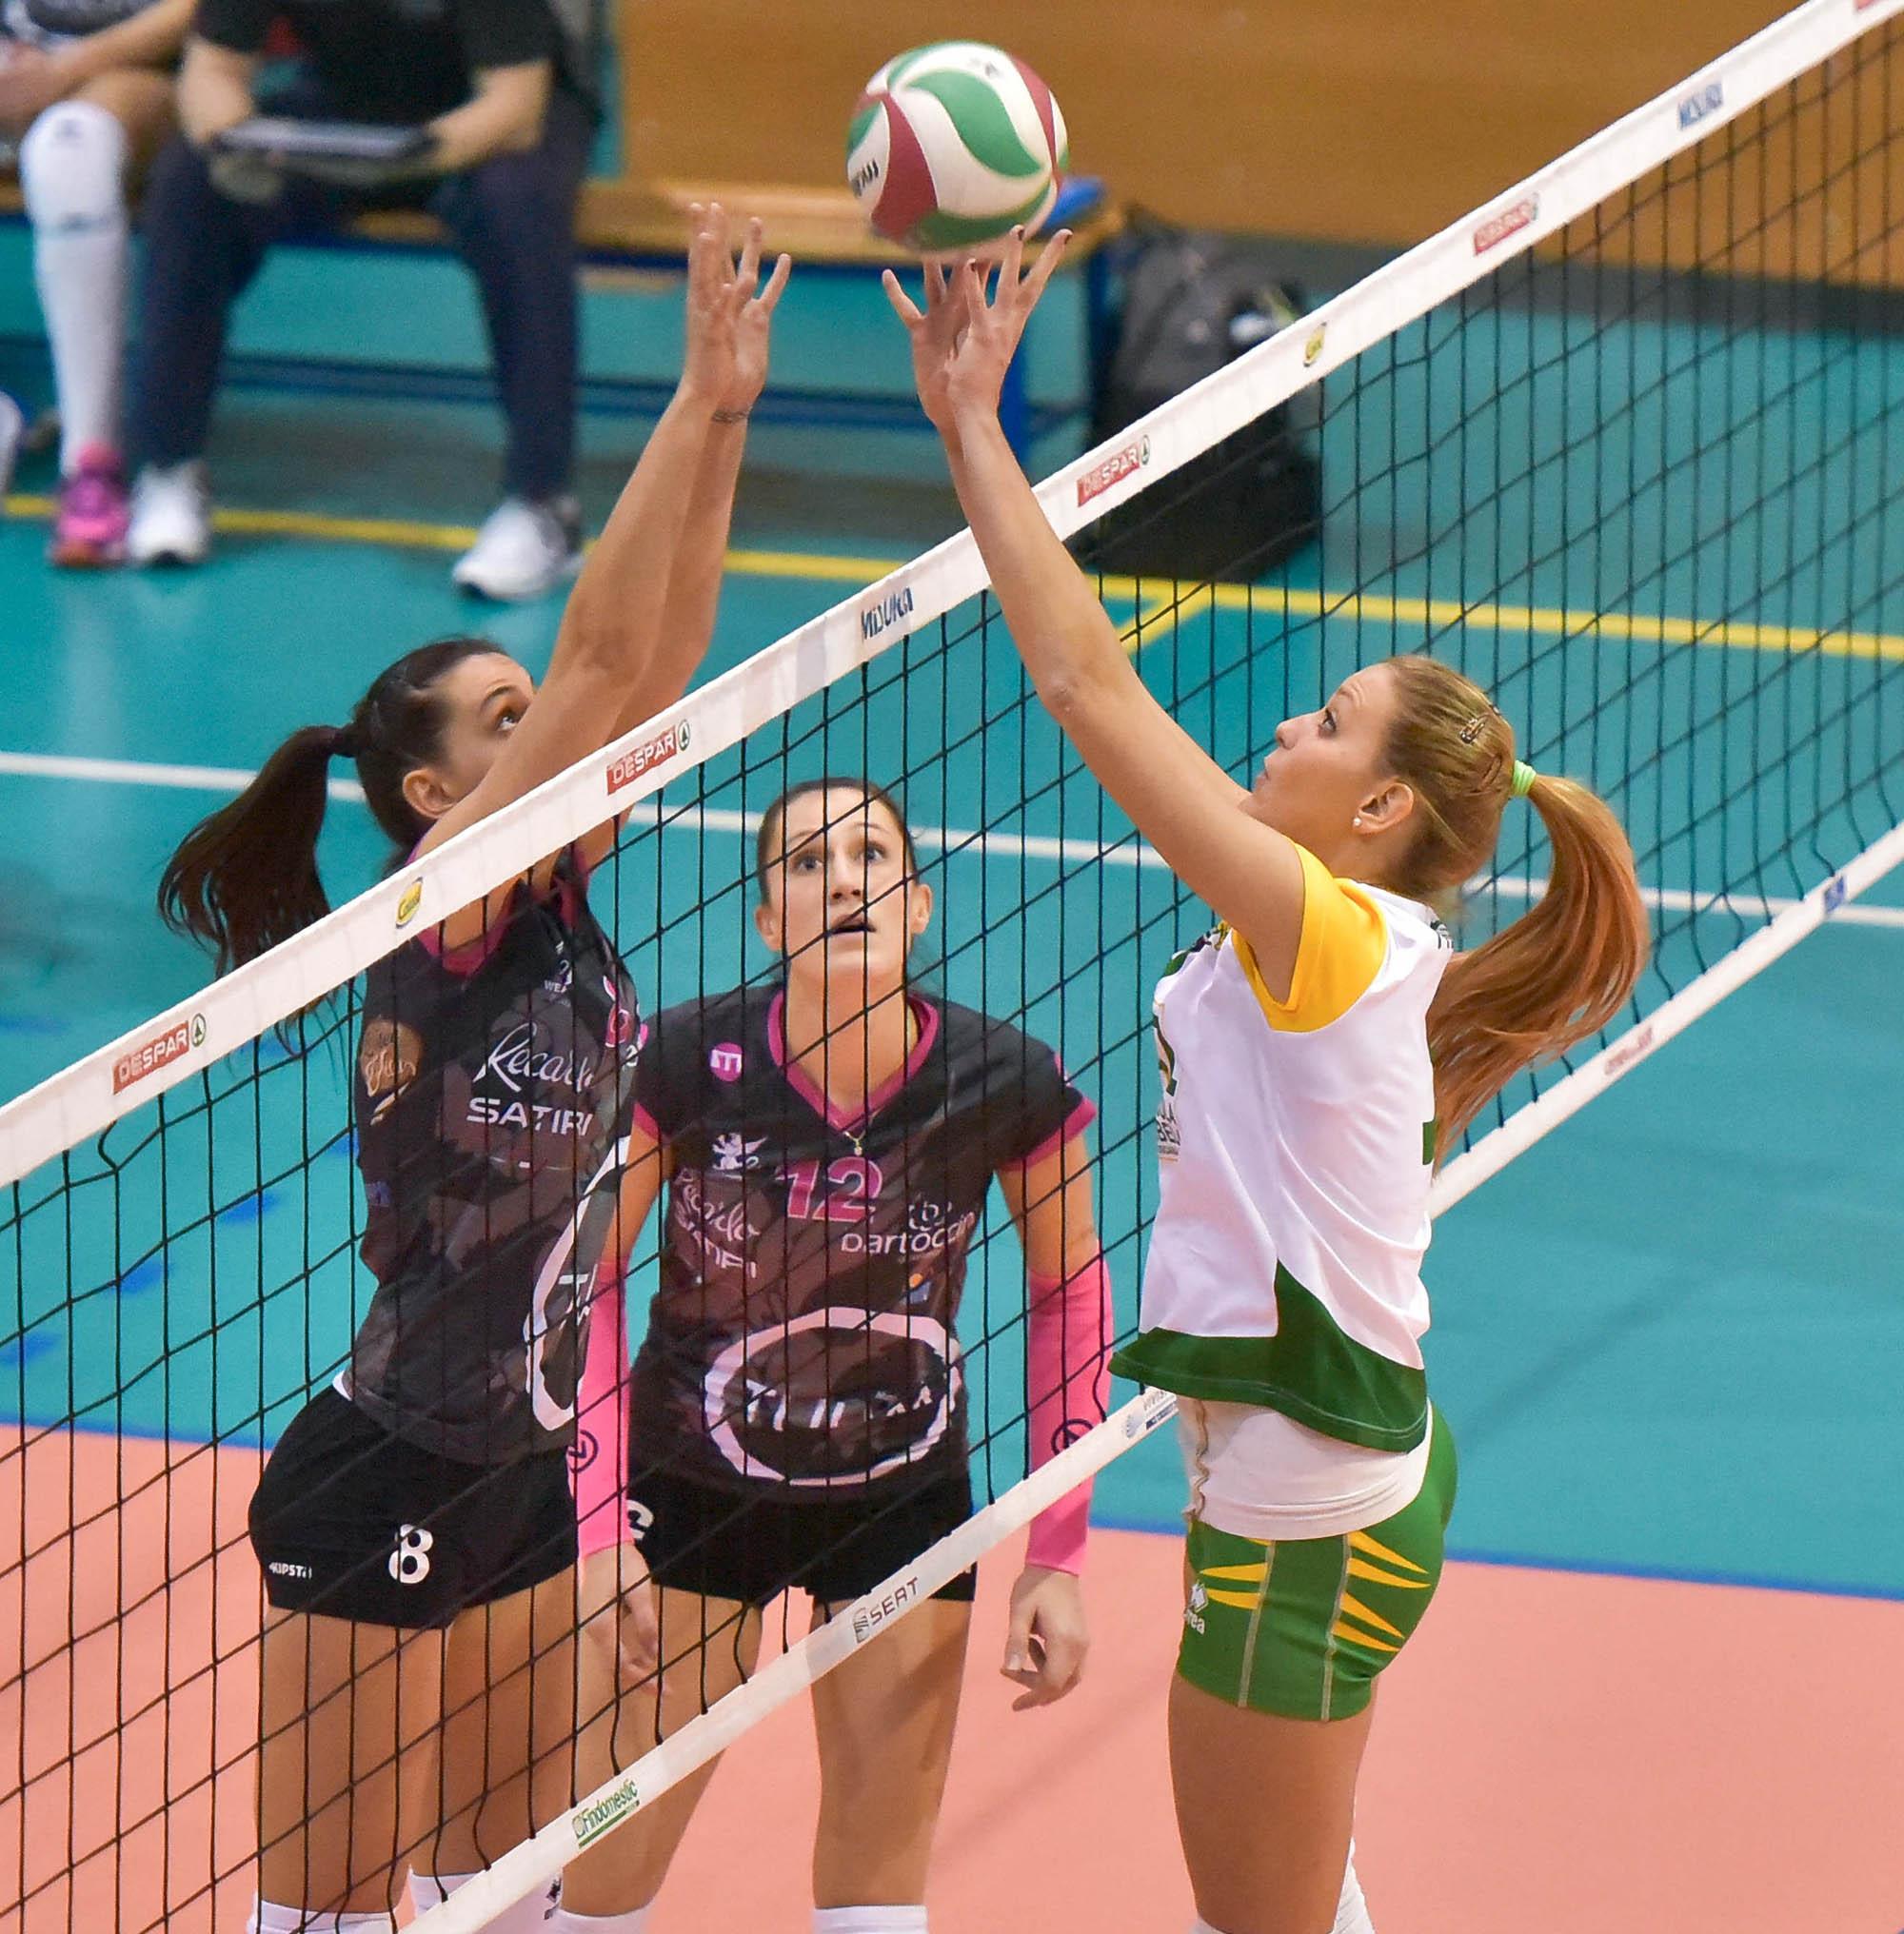 16ª giornata Campionato Serie B1 Femminile 2015-16, girone C PalaPapini Orvieto TR, 20.02.2016